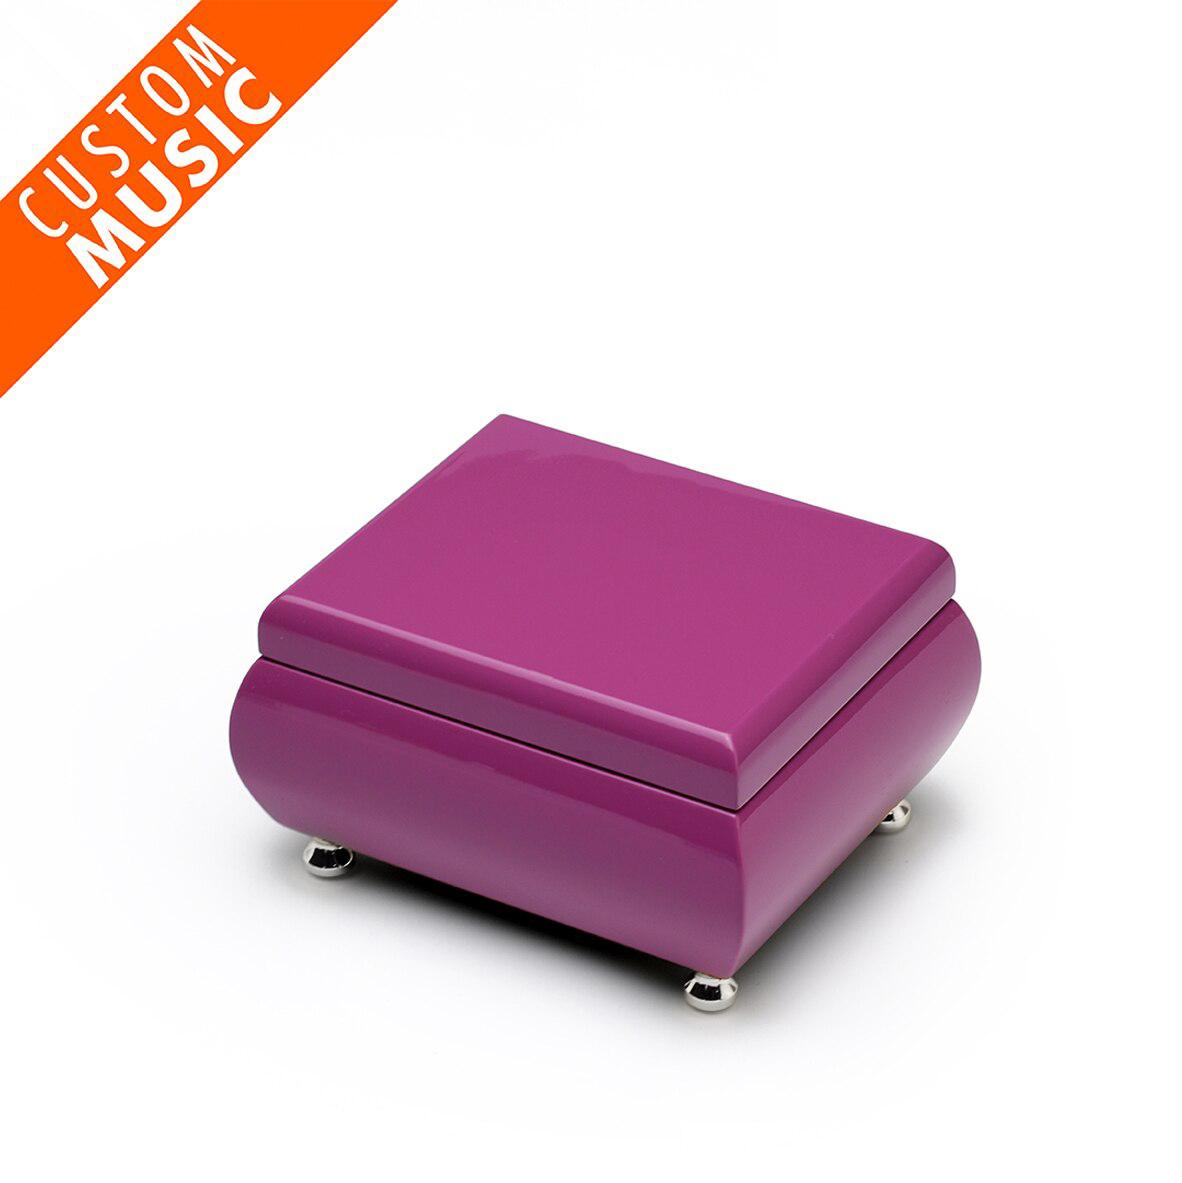 Vibrant Hi-gloss Lavender USB Sound Module Music Jewelry Box